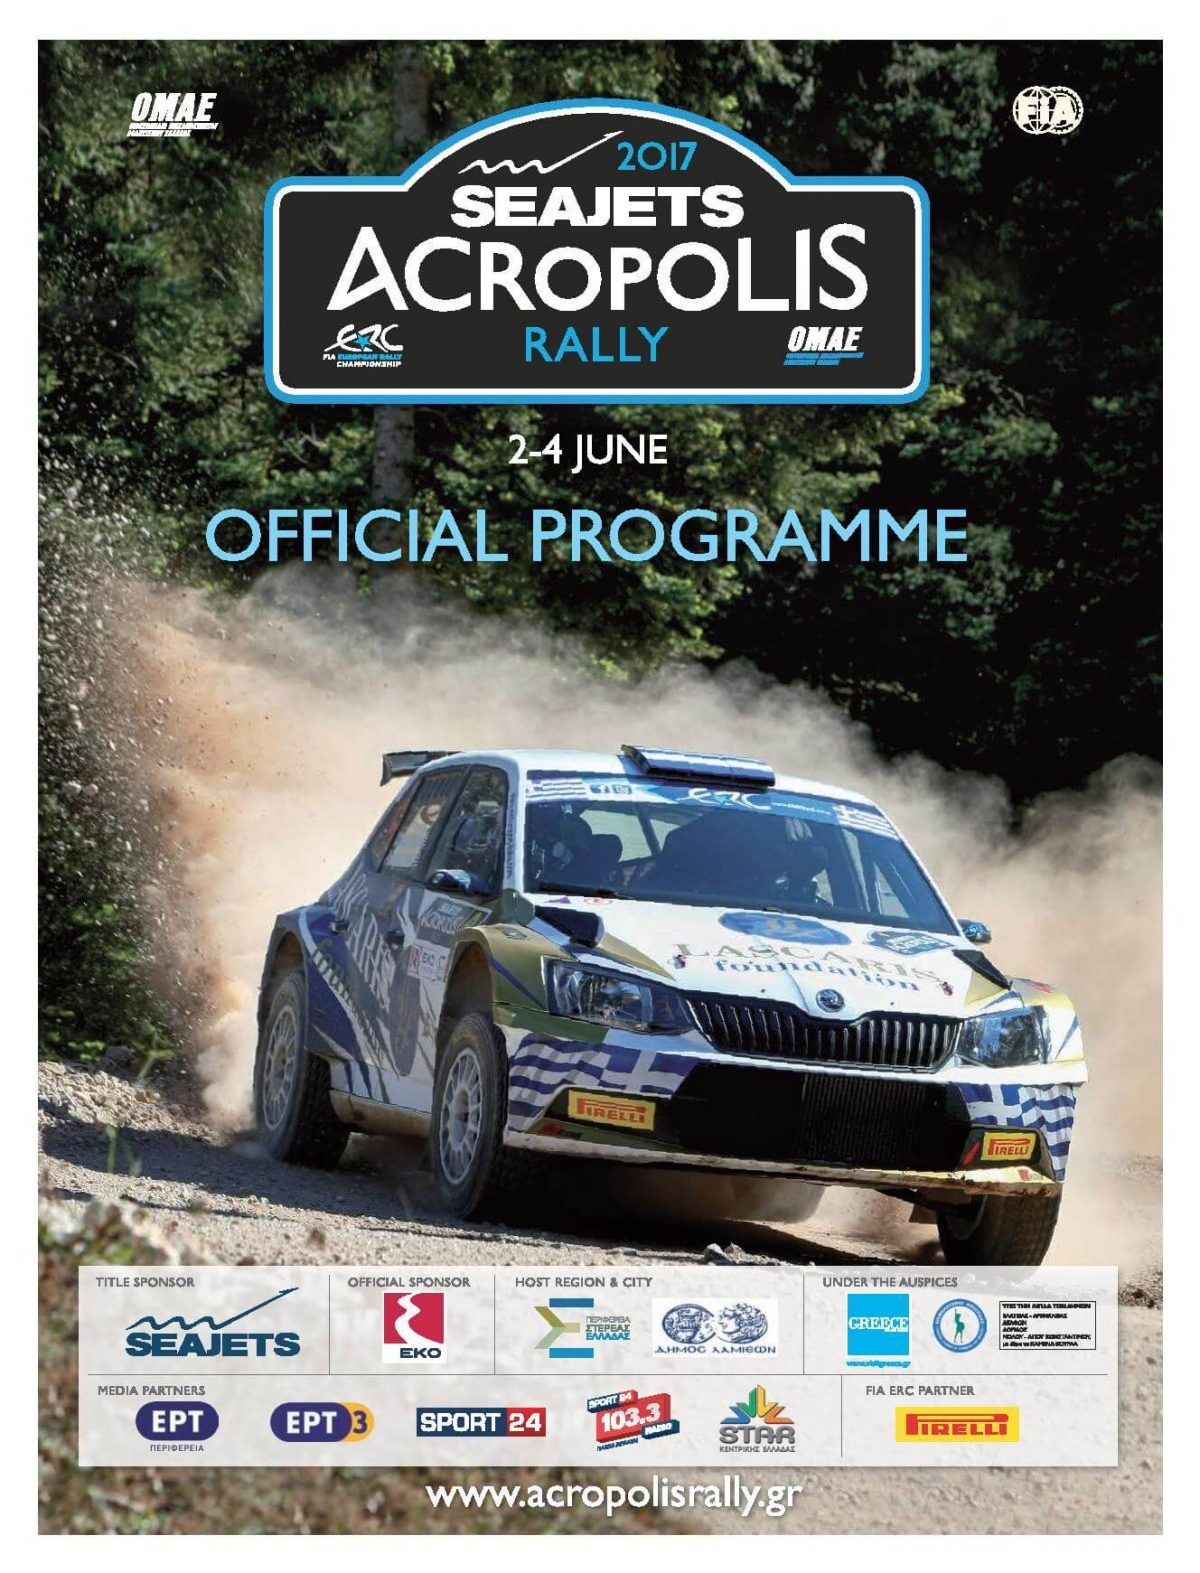 SEAJETS Acropolis Rally 2017 – GUIDE